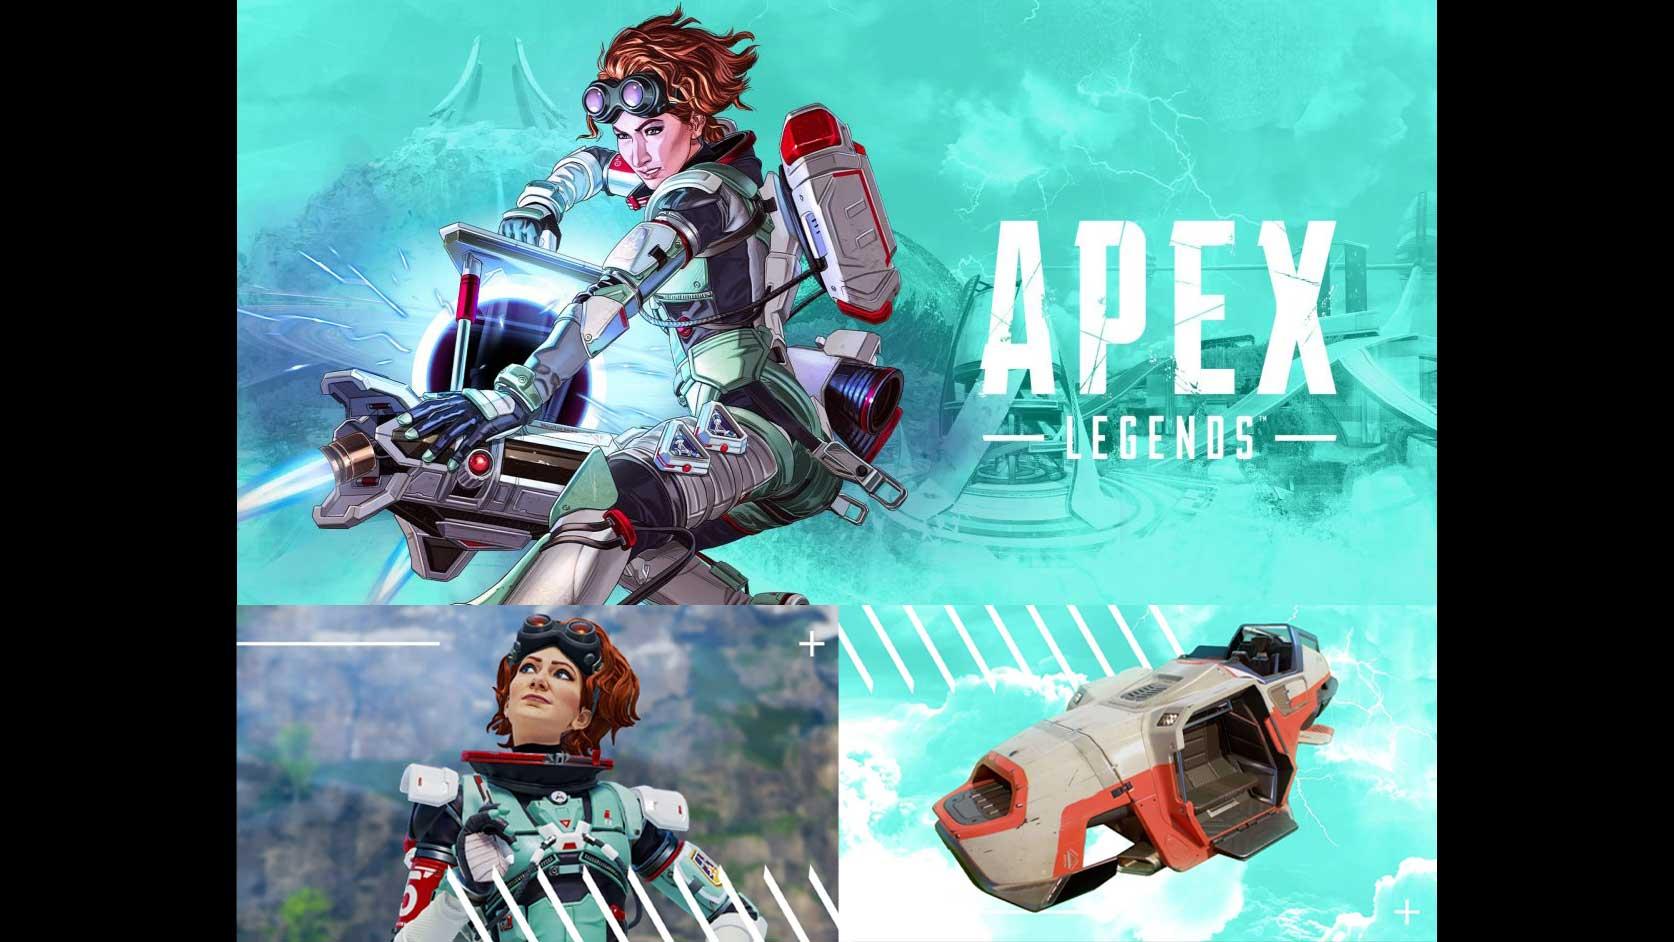 apex featured image season 7.jpg.adapt .crop191x100.1200w babt v2